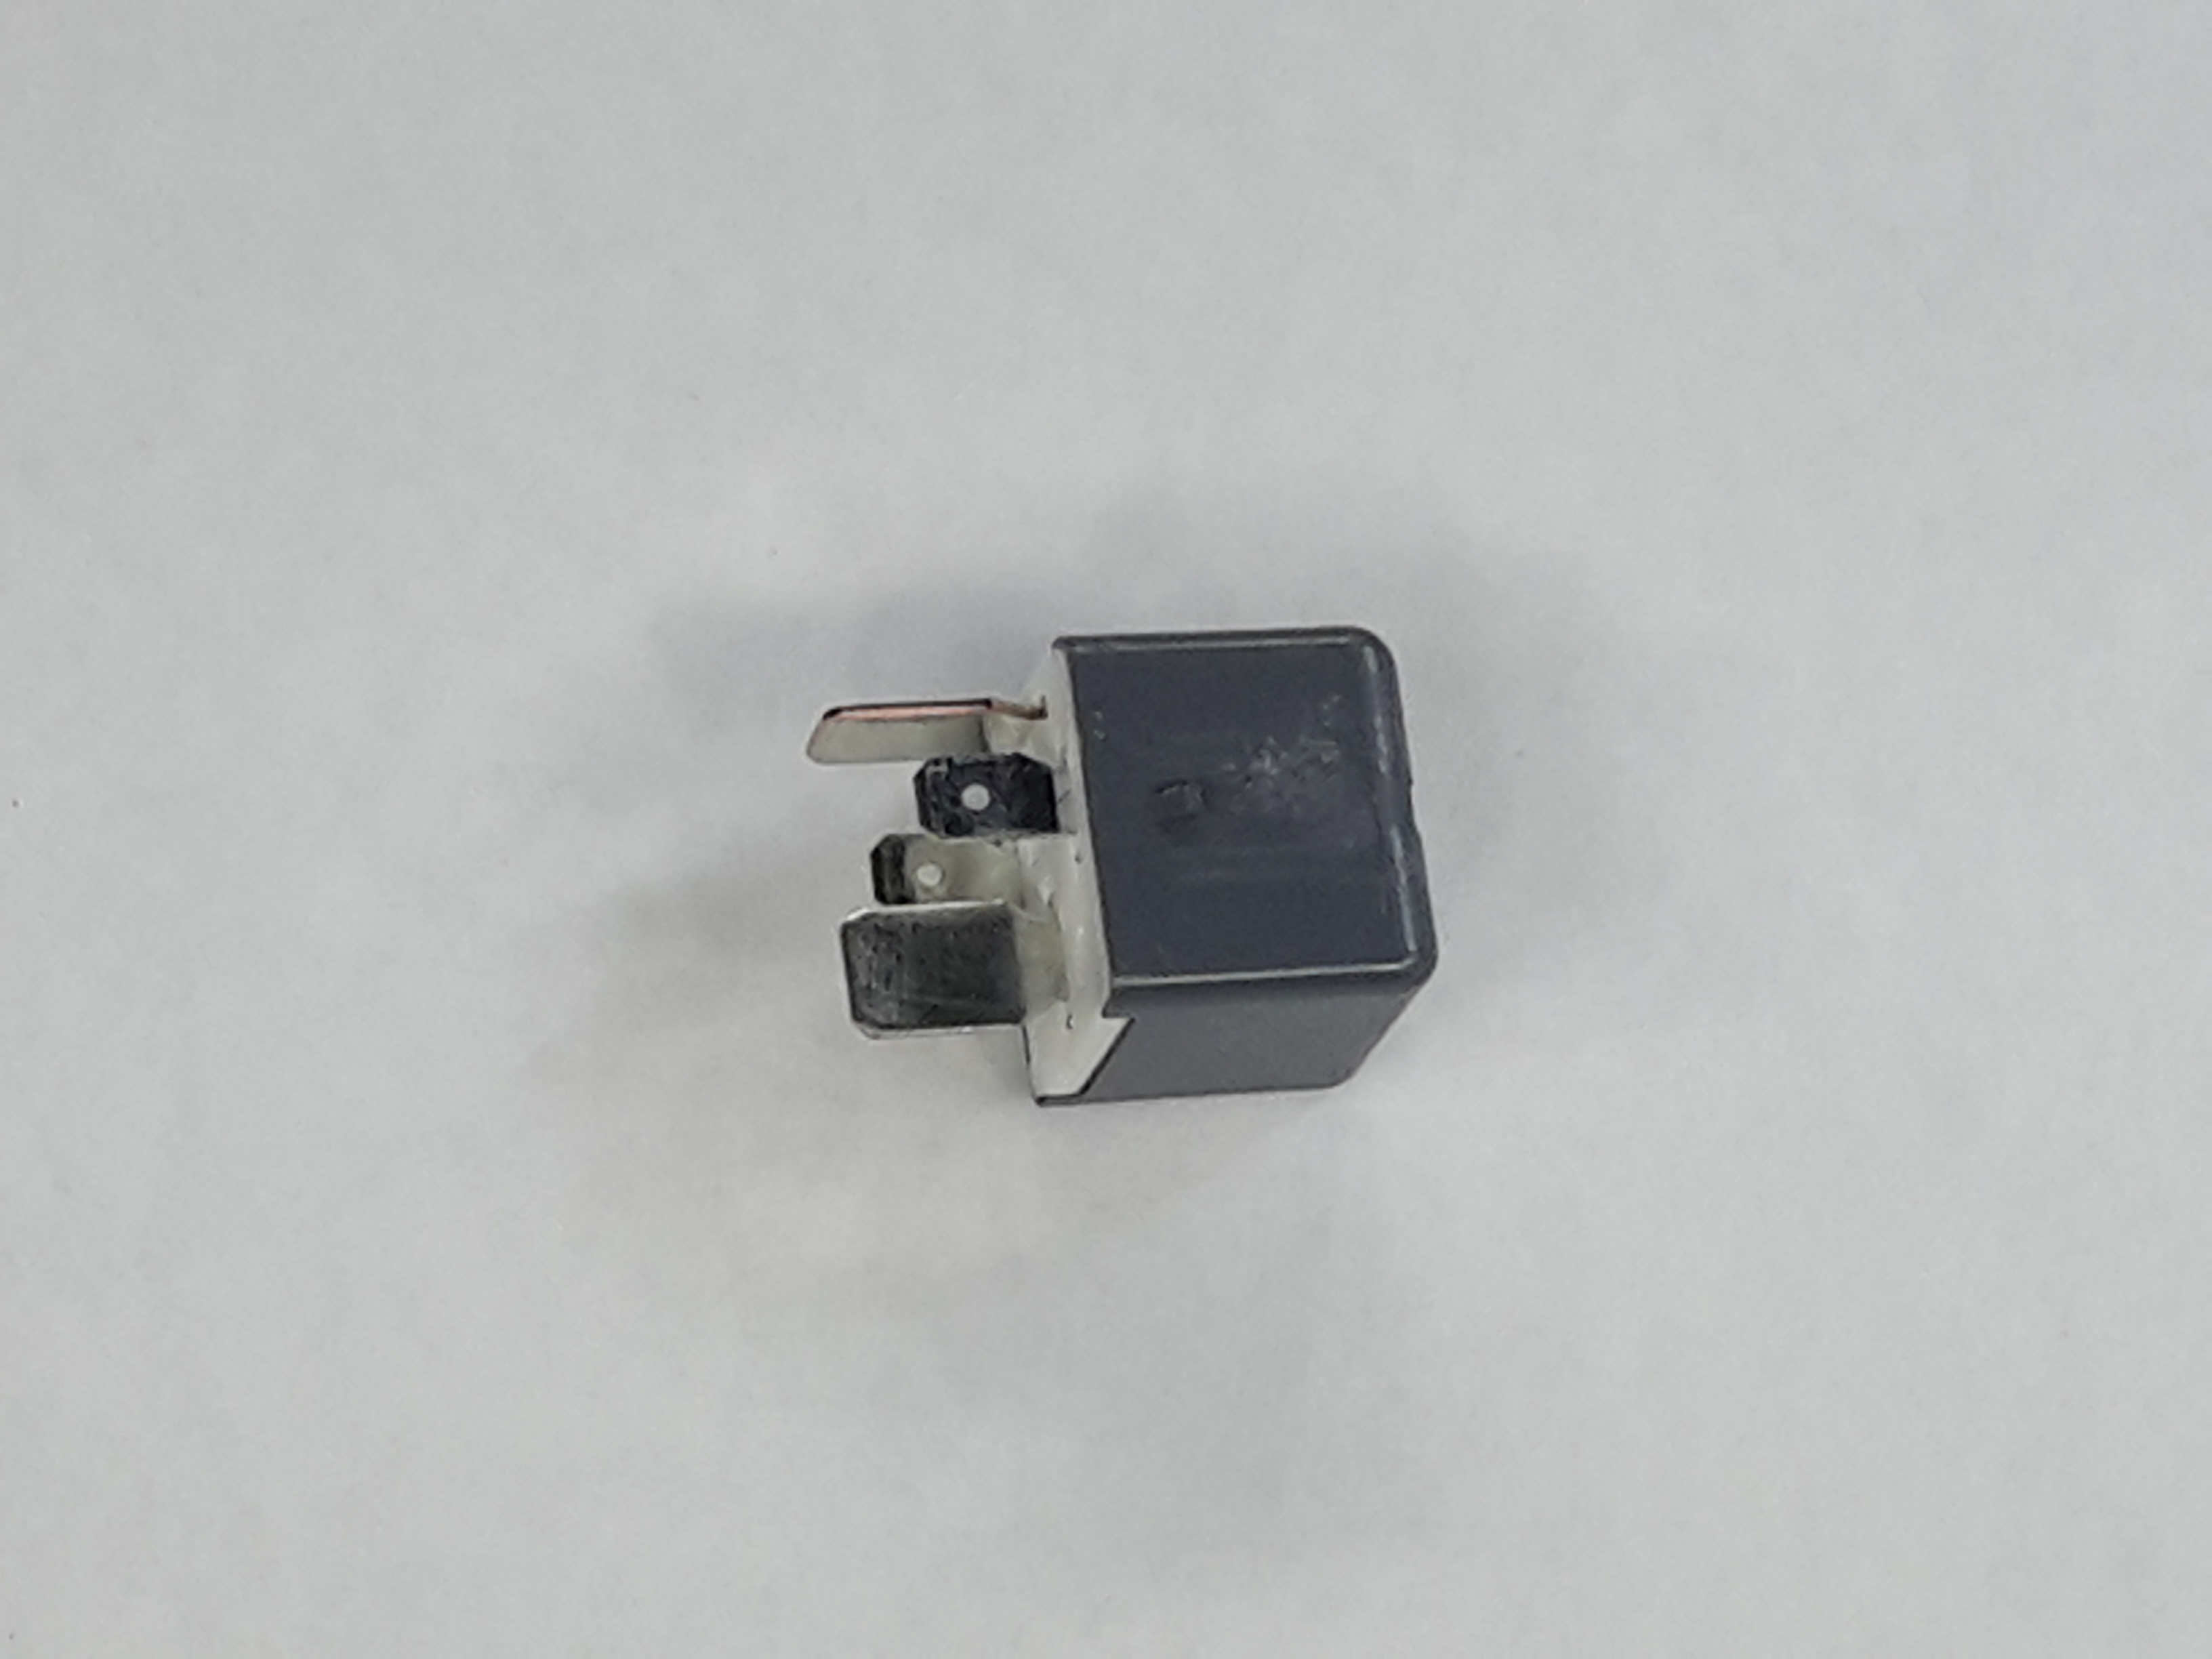 subaru outback relay fuse box electrical 82501ag08a. Black Bedroom Furniture Sets. Home Design Ideas